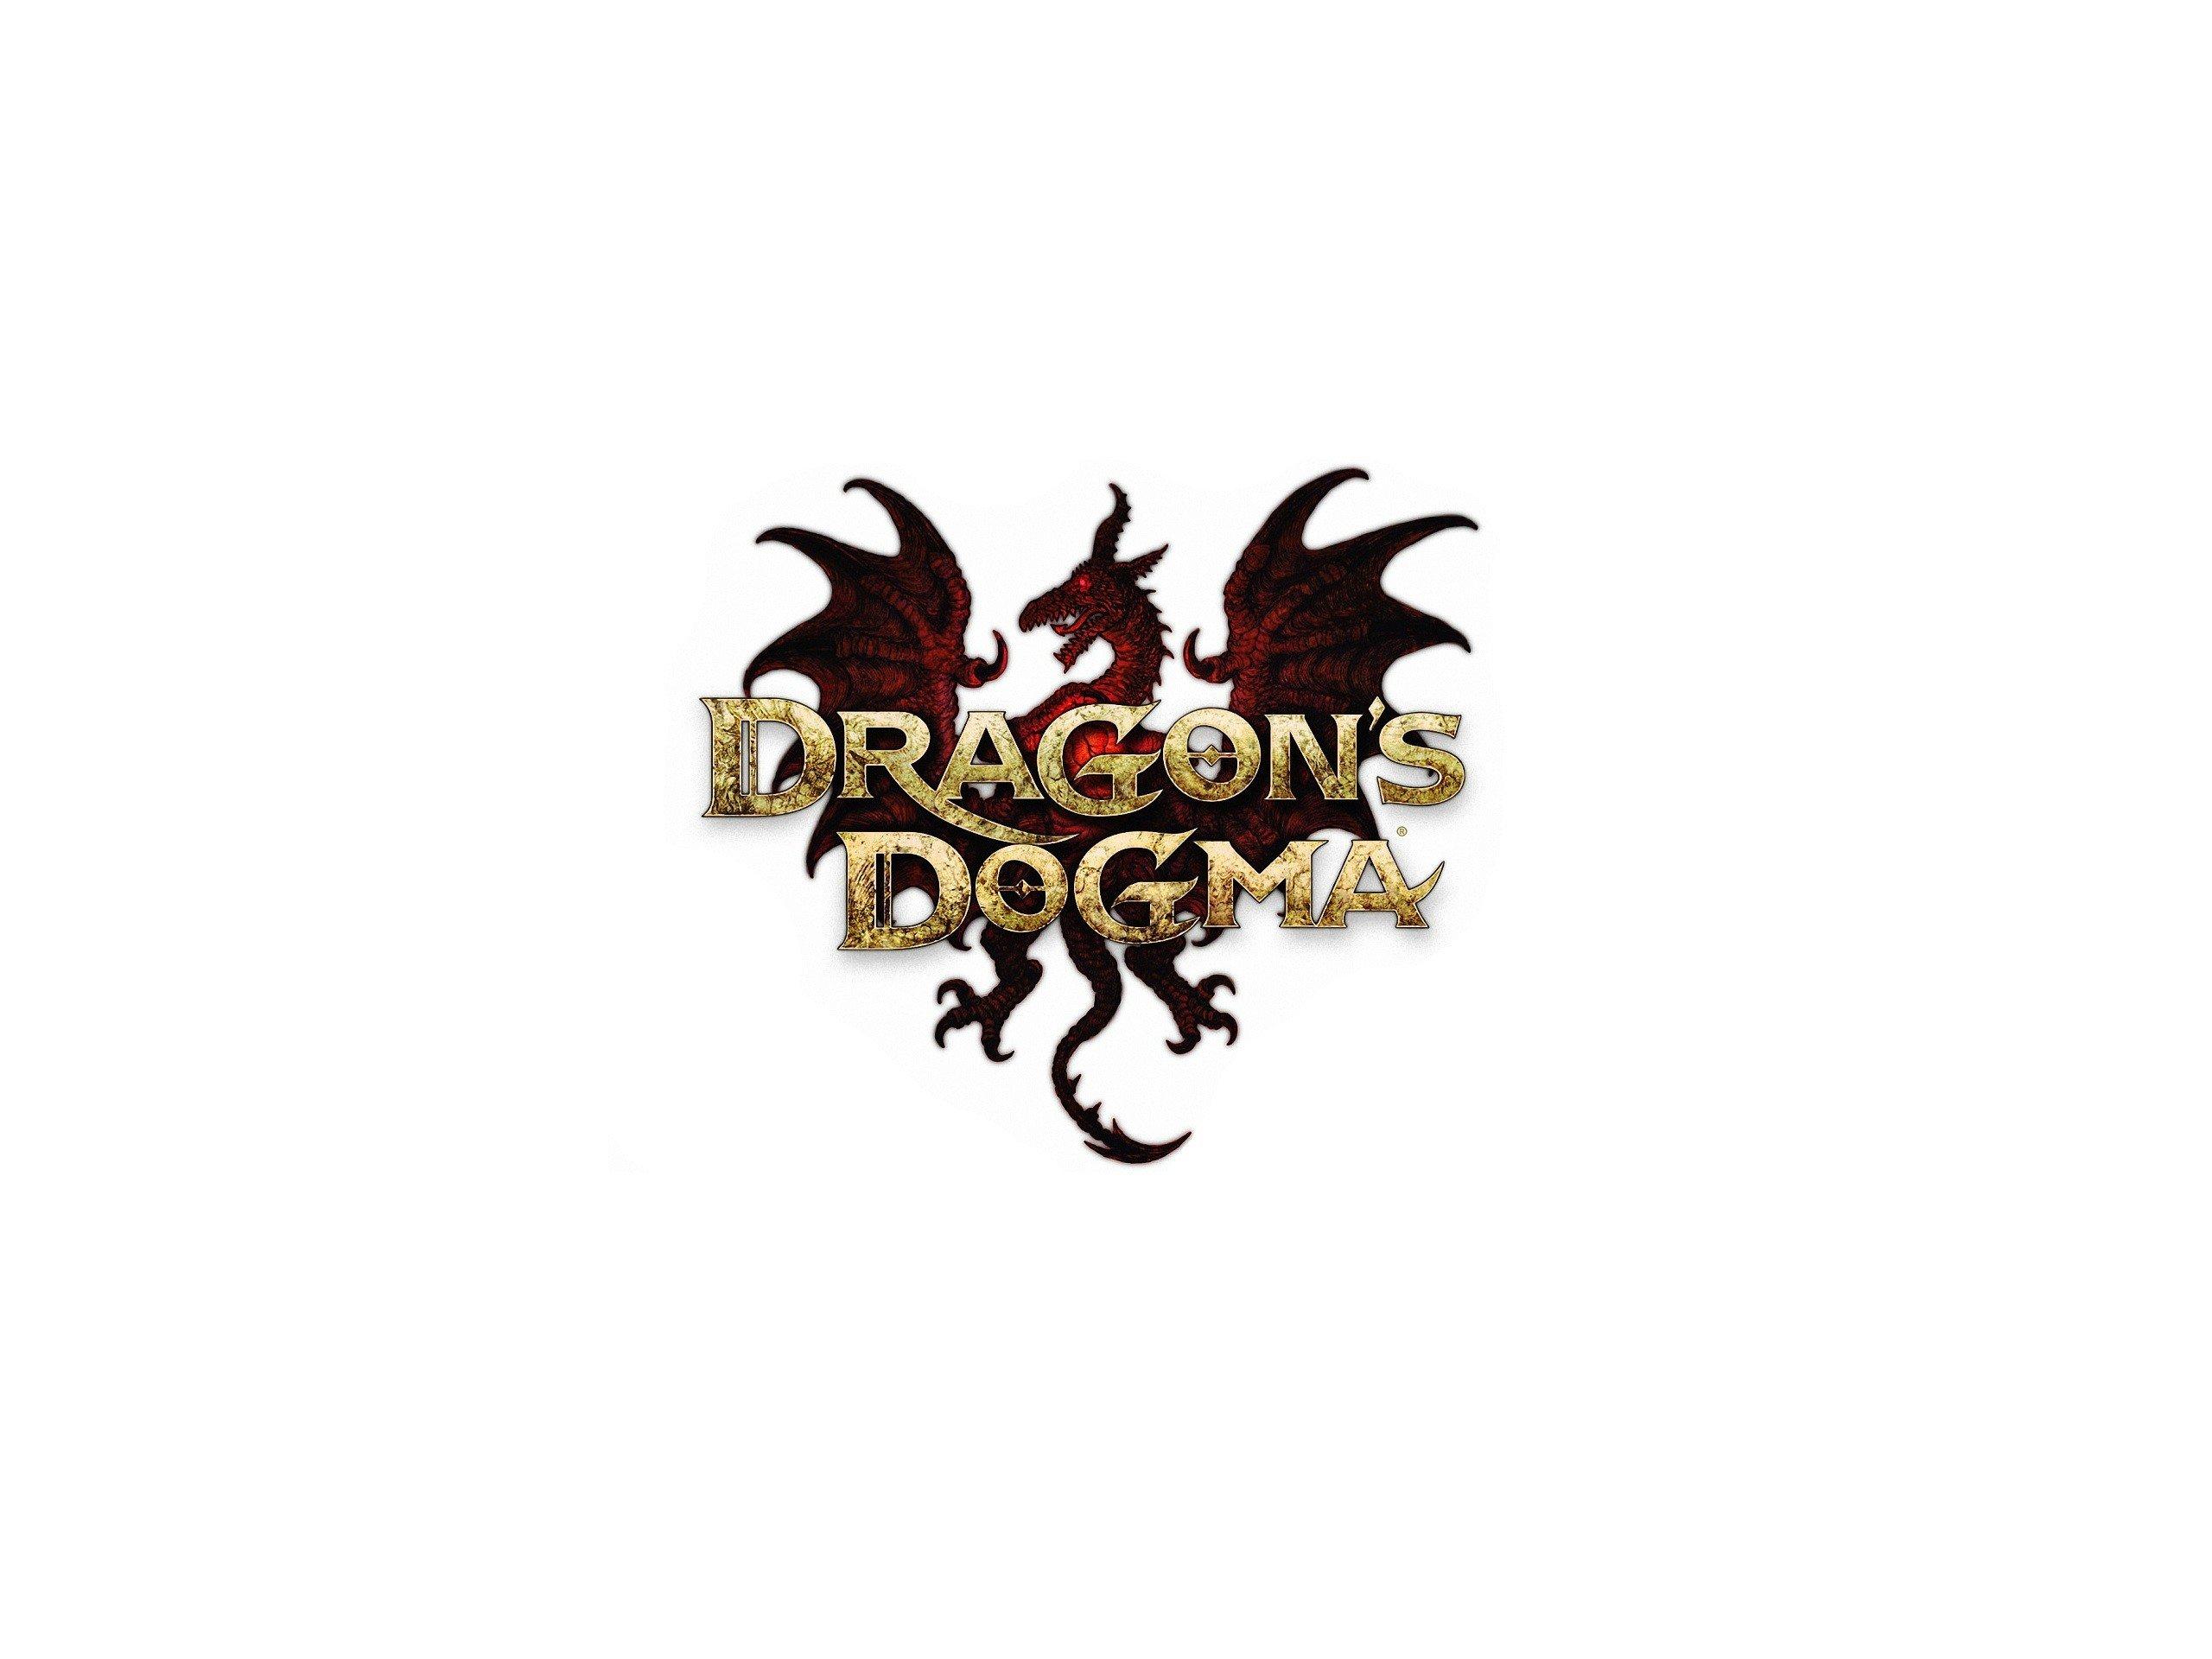 warriors medieval logos dragons dogma wallpaper